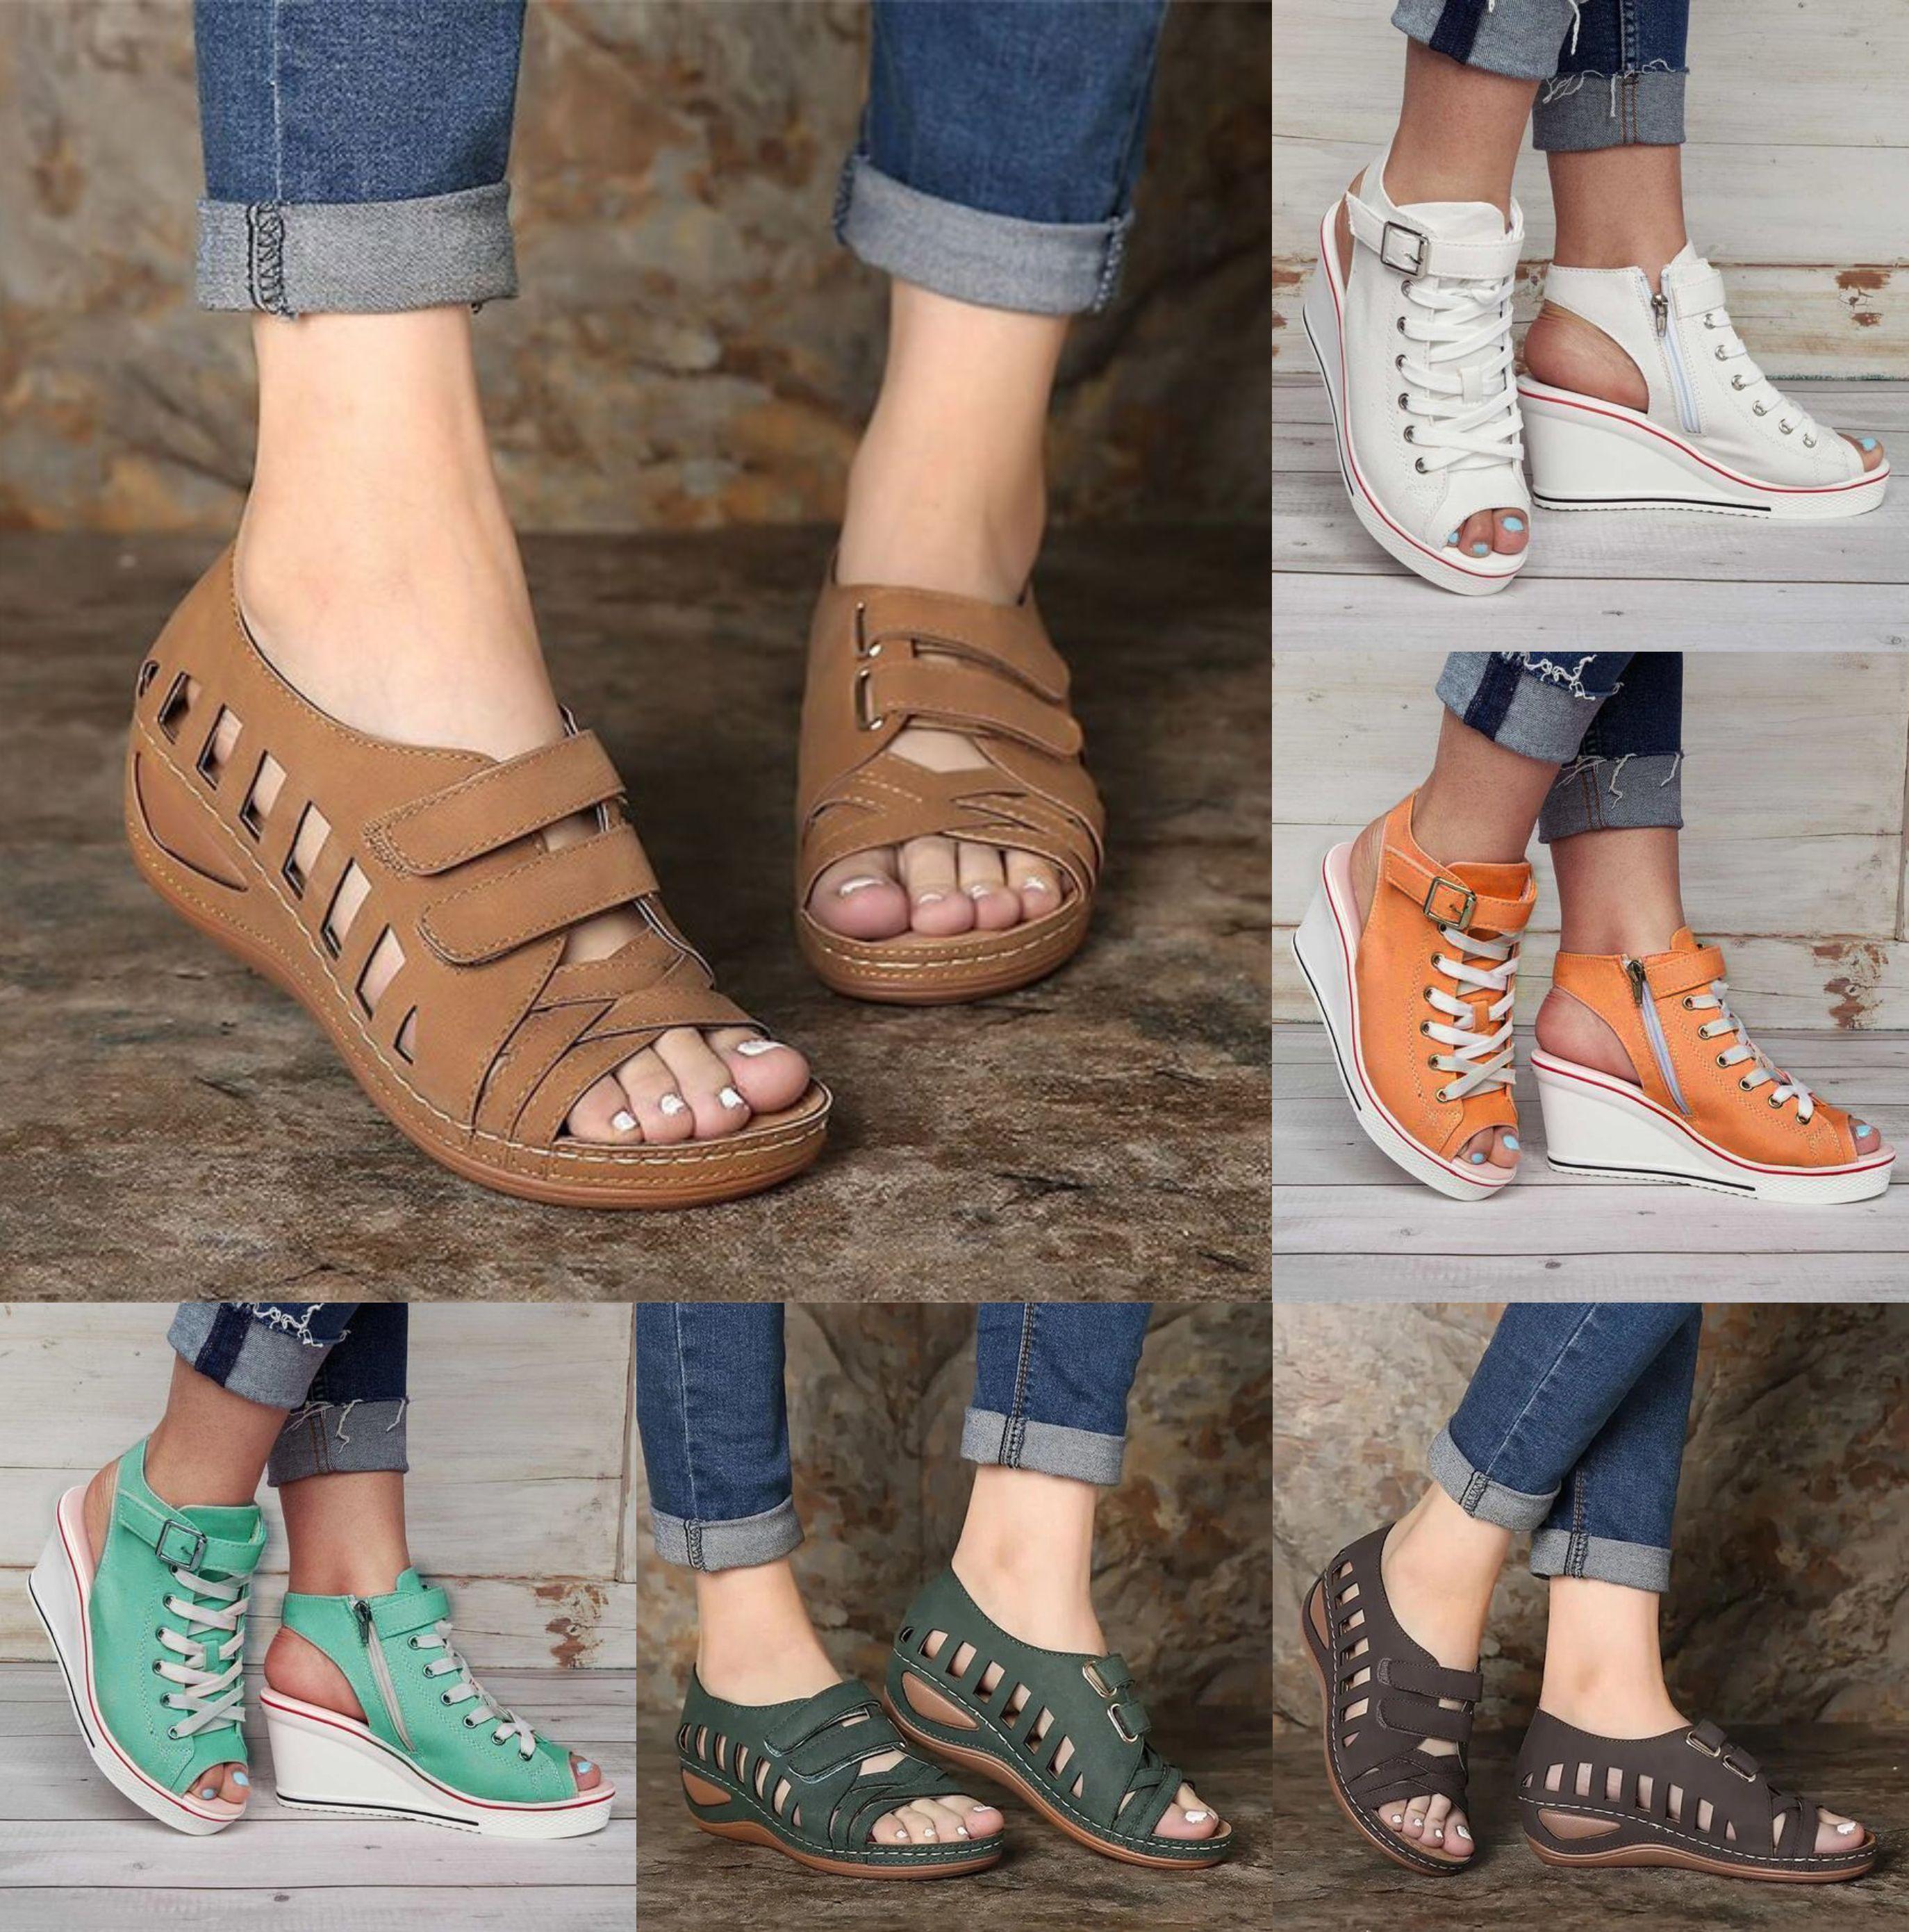 Women's Non-Slip Wedge Sandals nel 2020